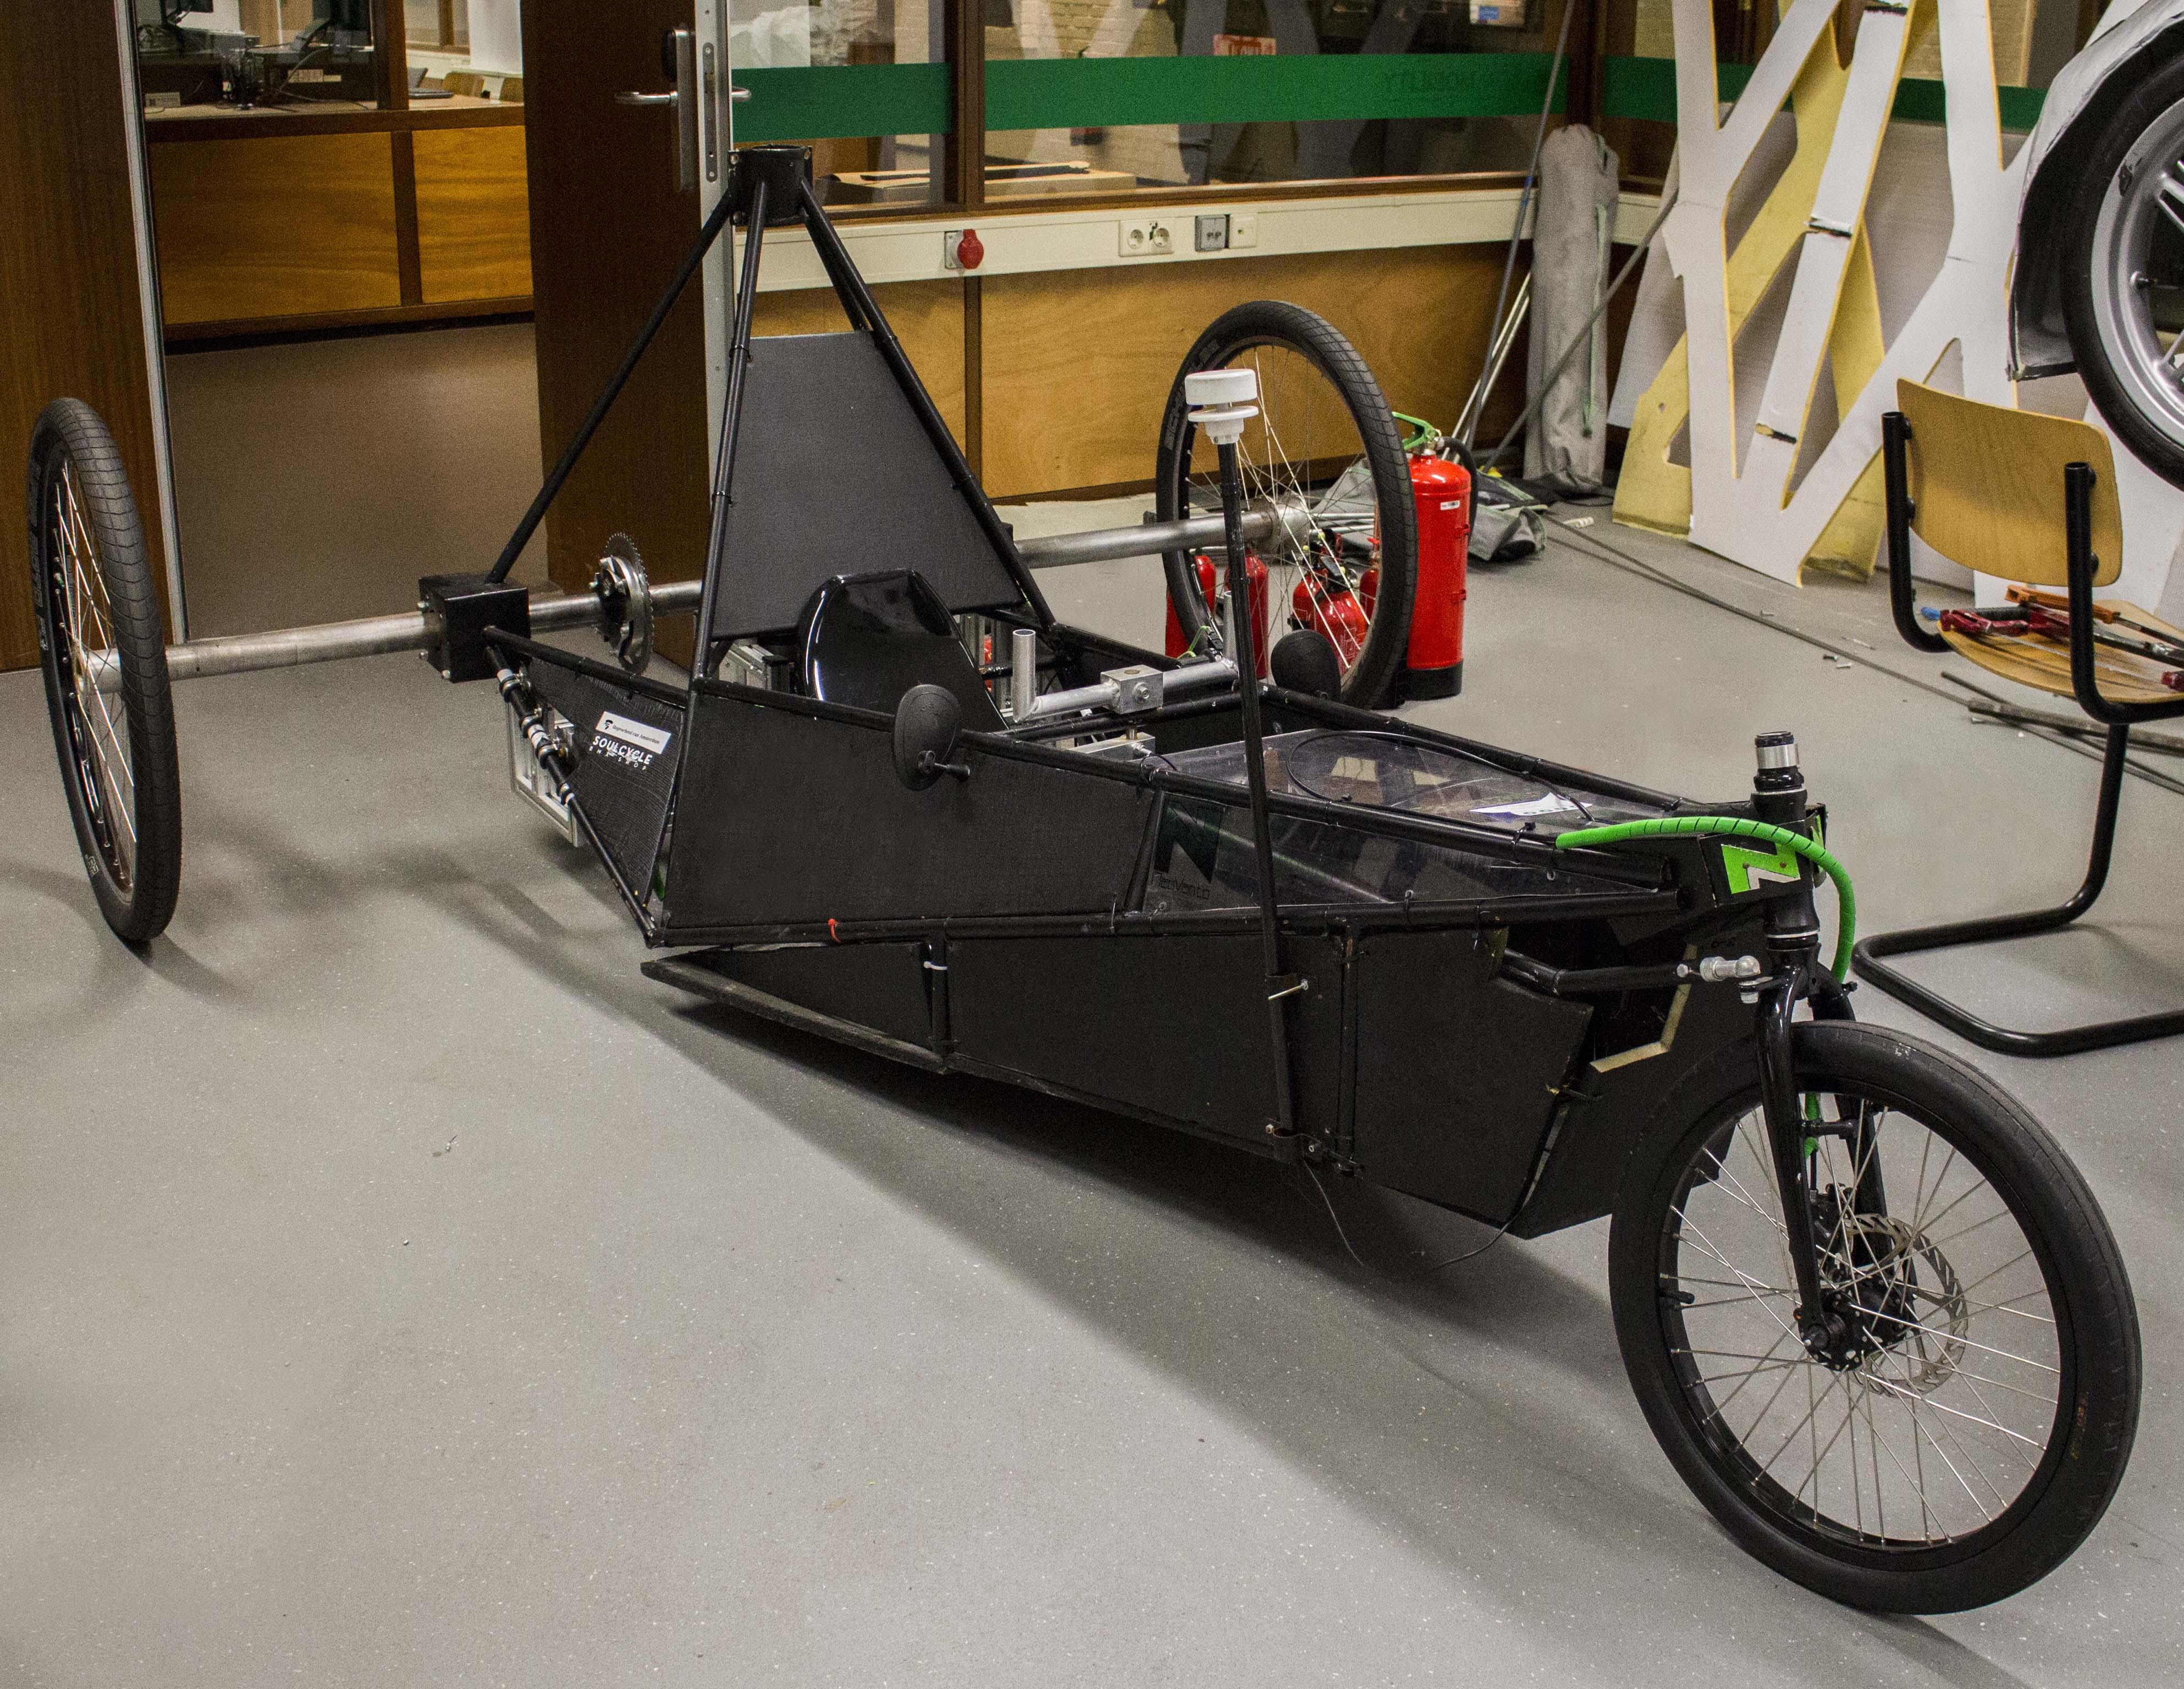 Car_Leapfrog-3D-Printers_Clean-Mobility_Testimonial